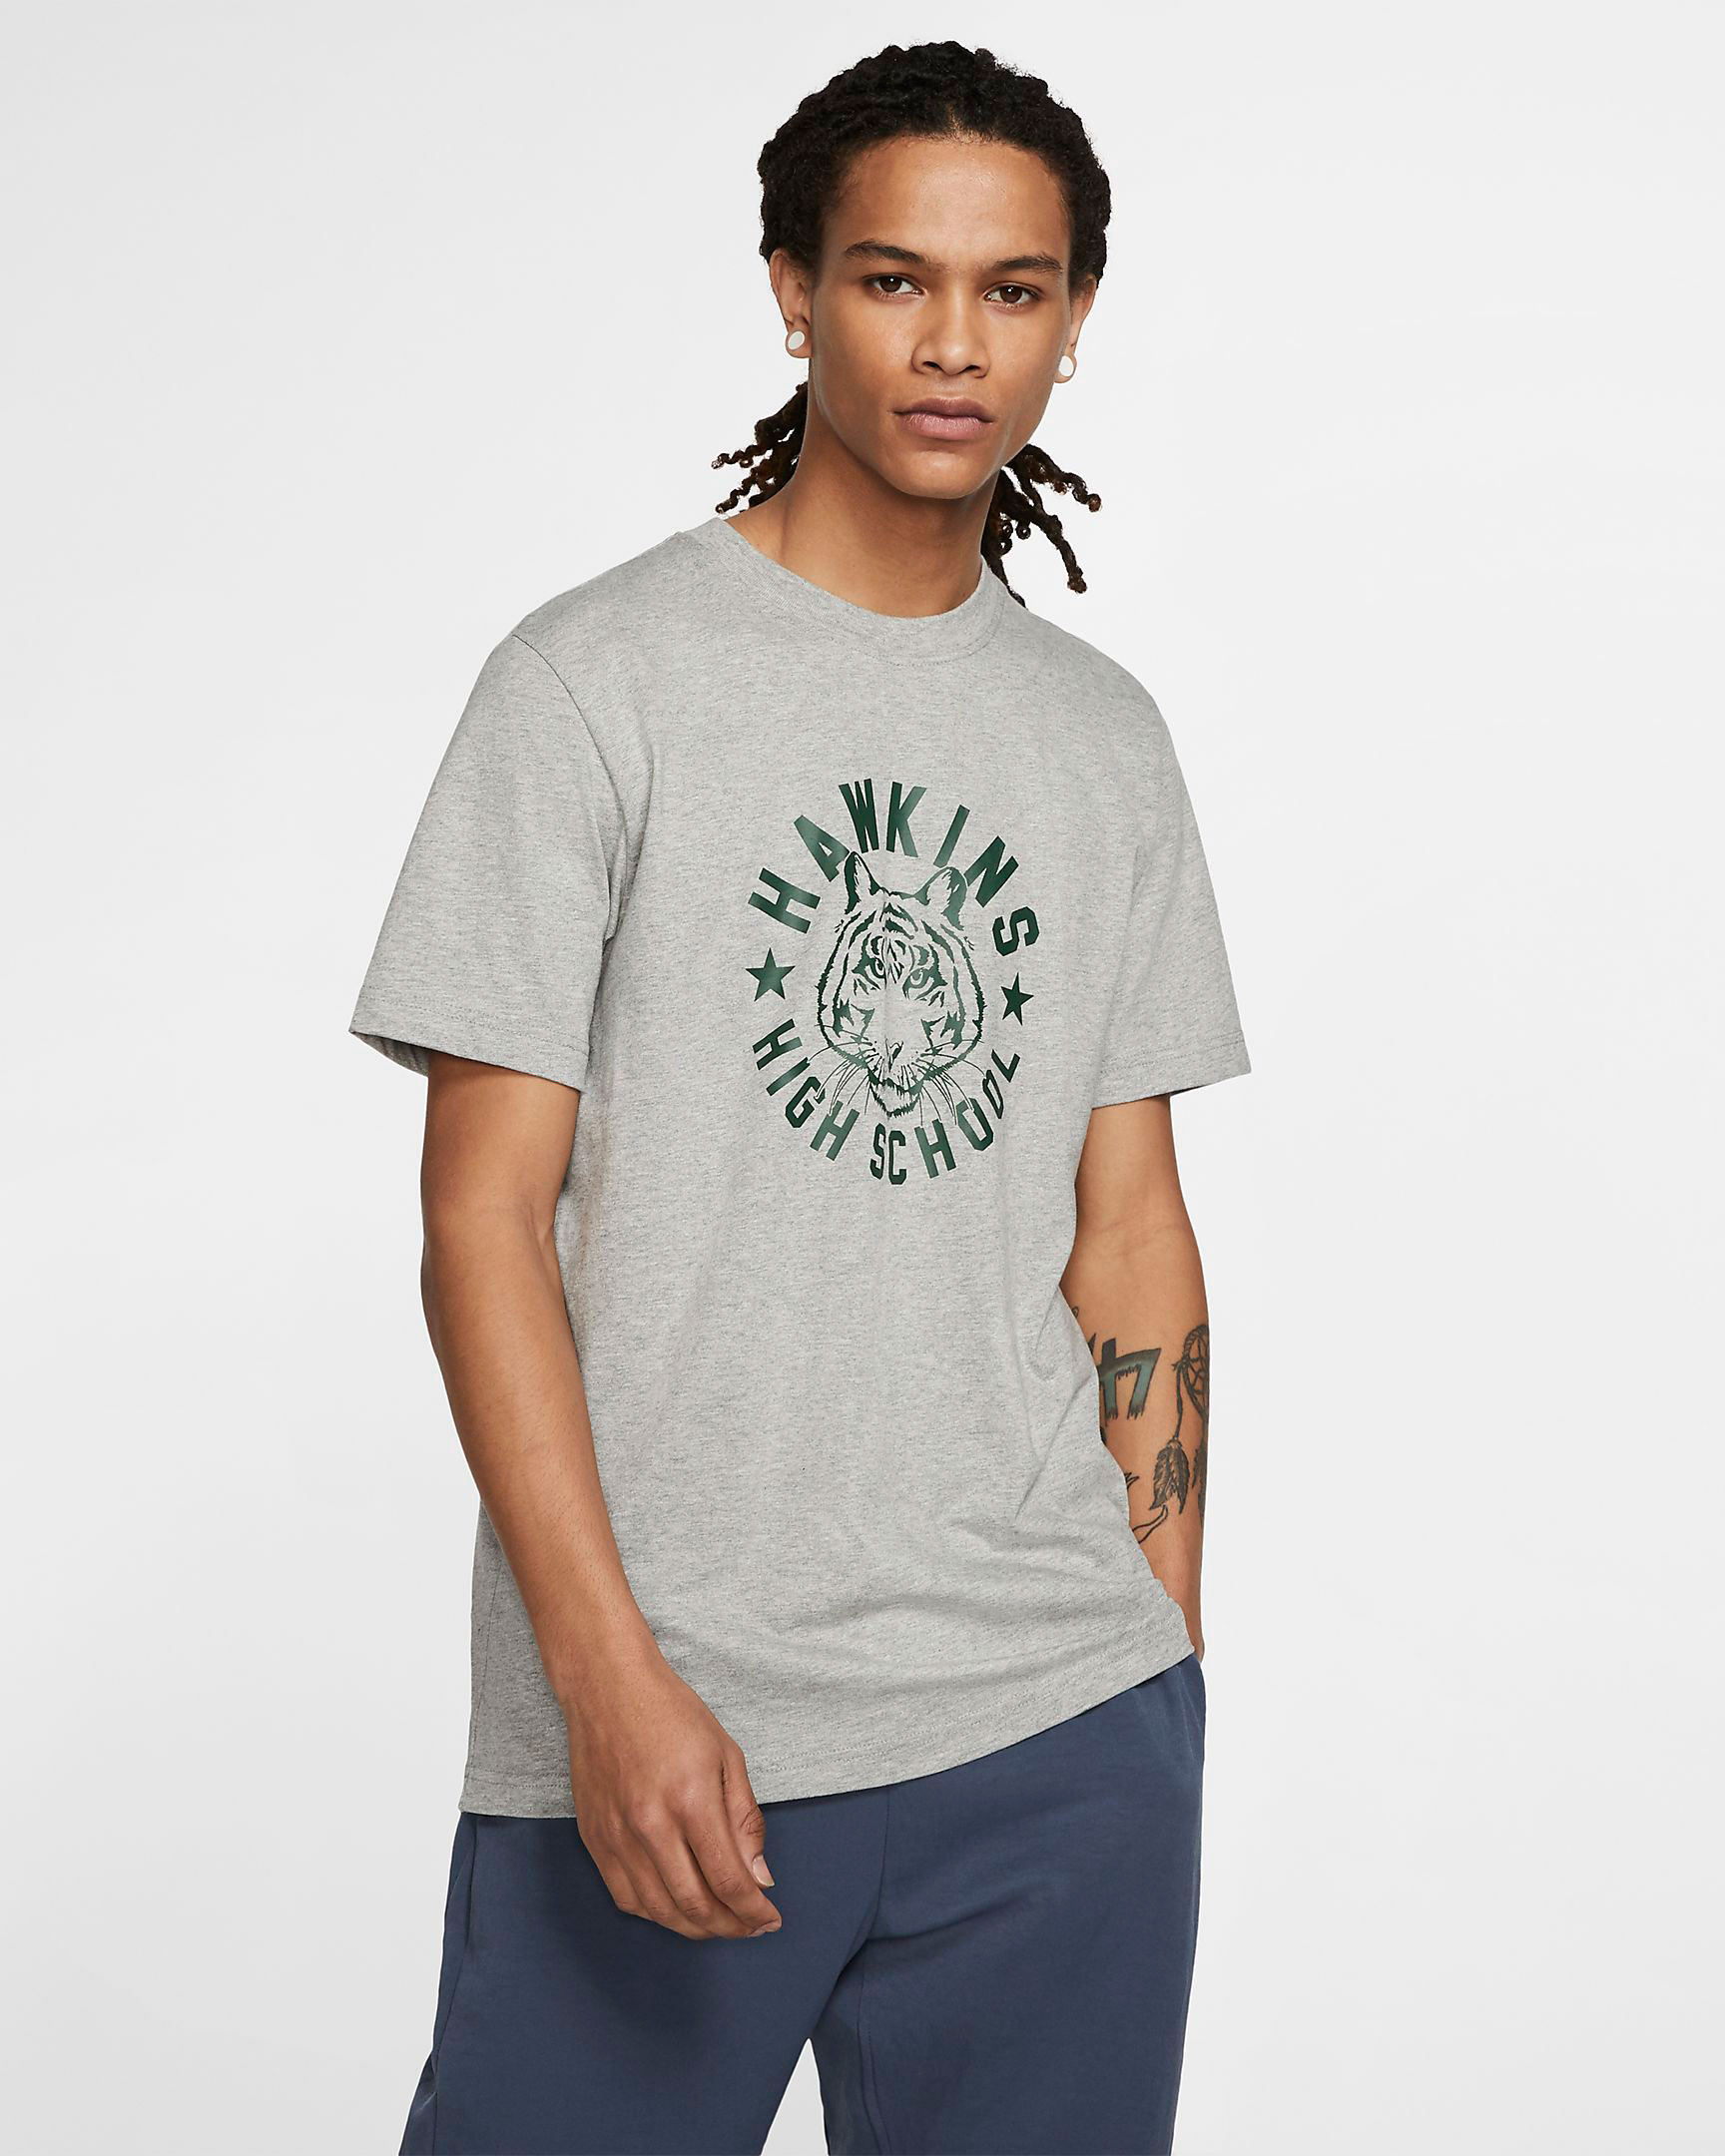 nike-stranger-things-hawkins-high-t-shirt-grey-1